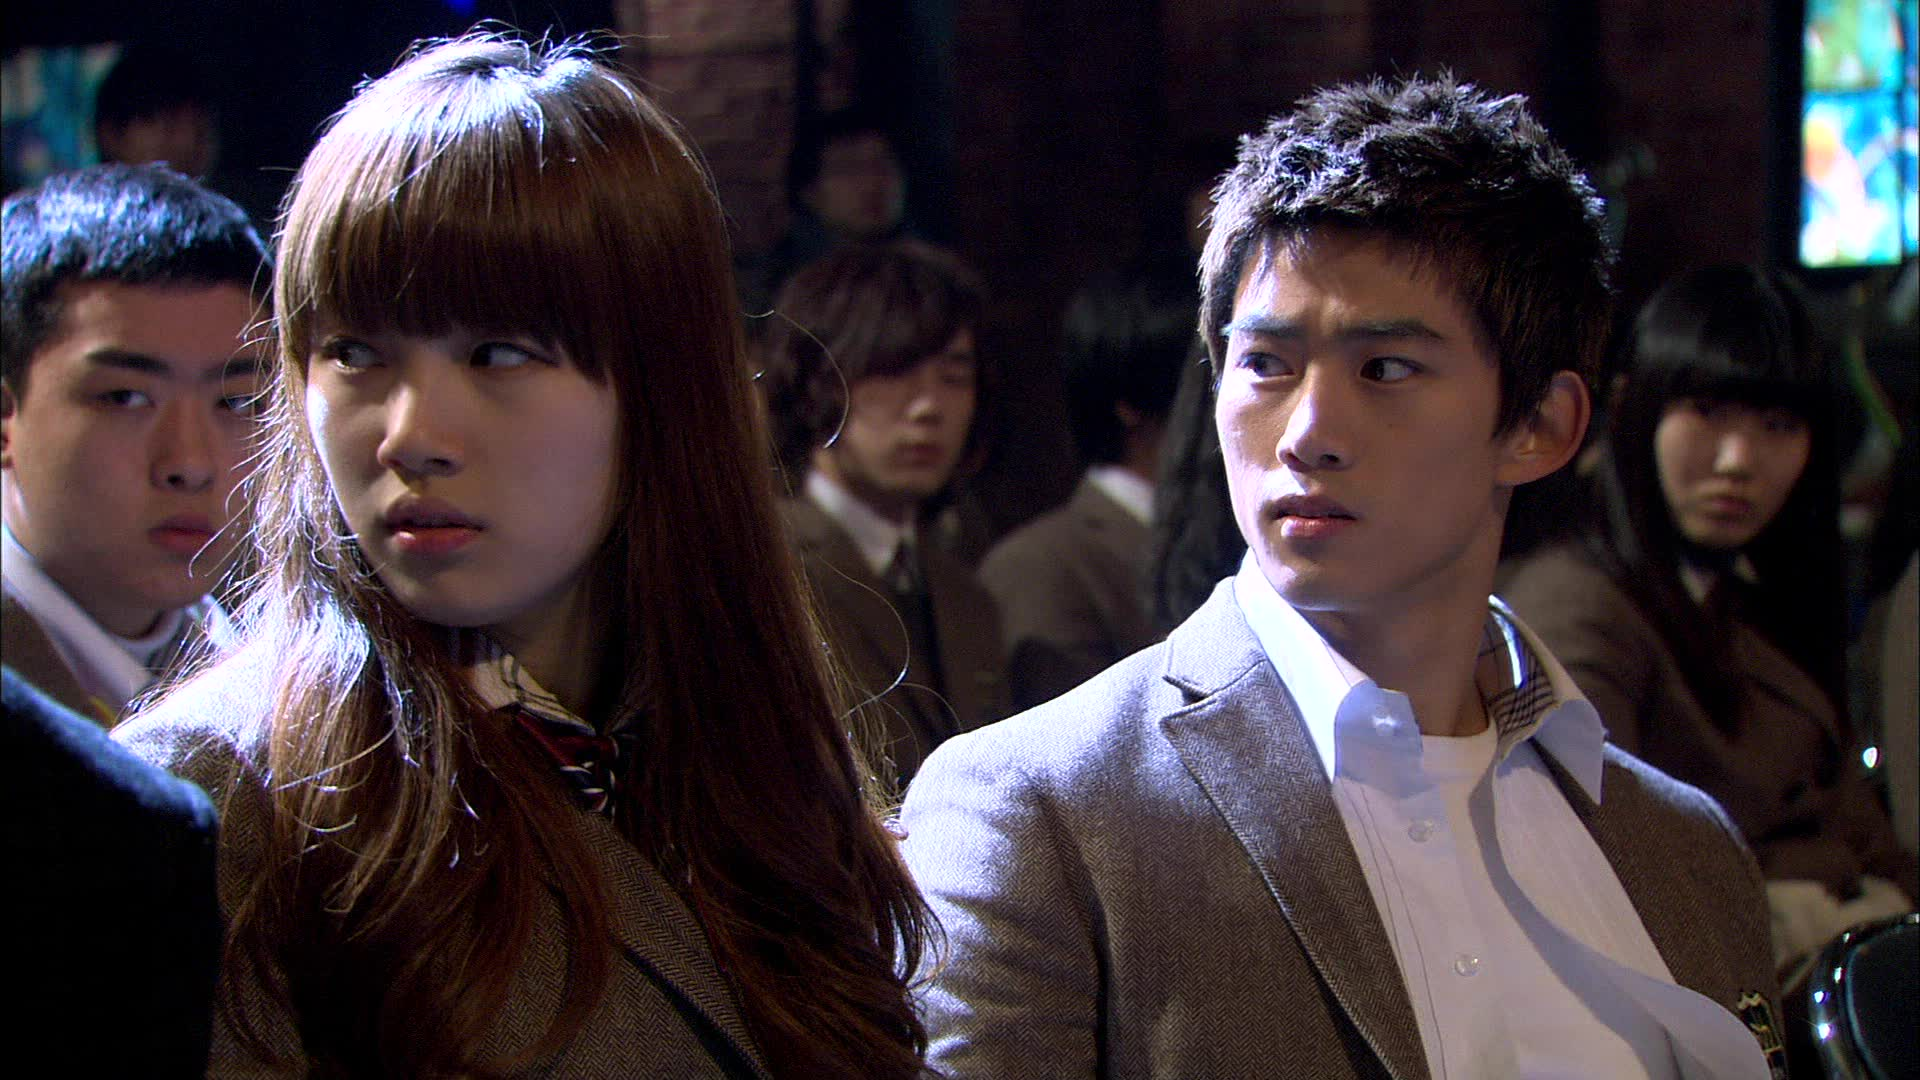 dream high episode 4 - 드림하이 - watch full episodes free - korea